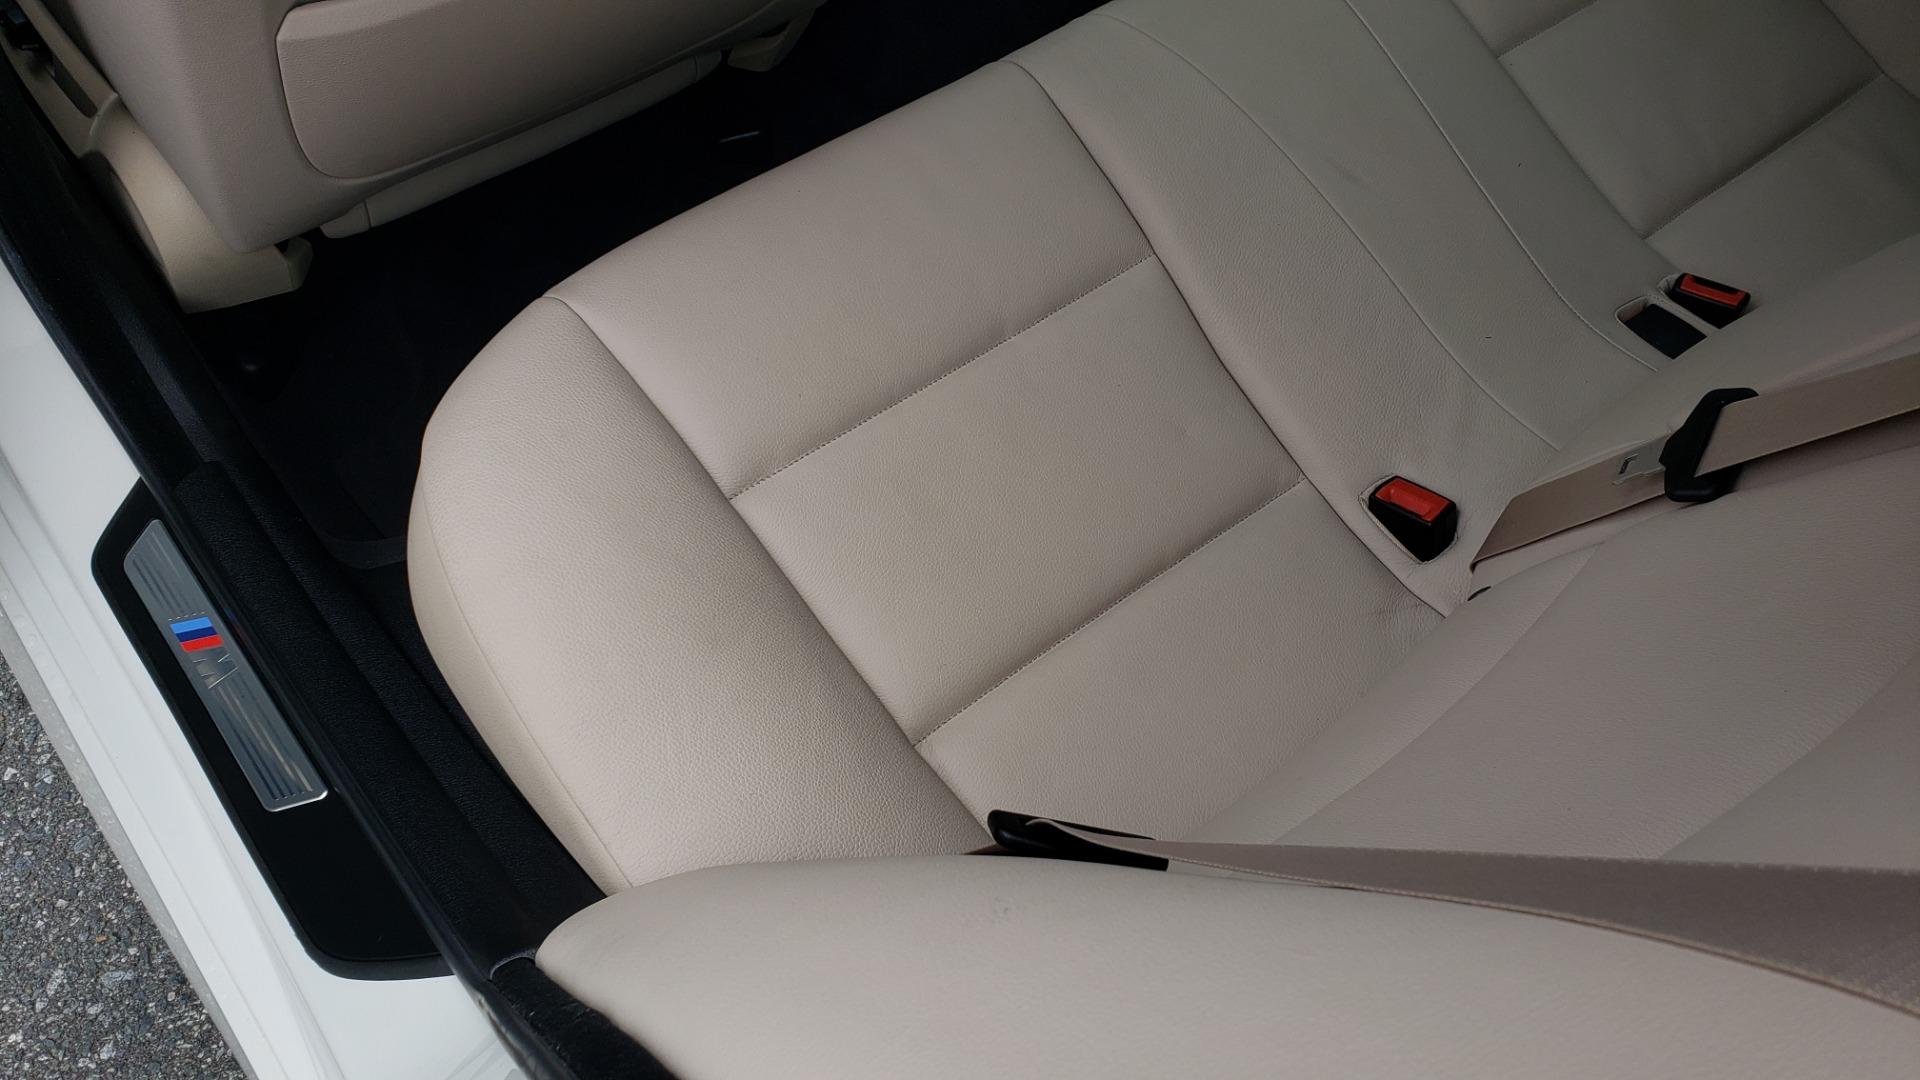 Used 2012 BMW 5 SERIES 550I M SPORT / NAV / CONV PKG / SUNROOF / PREM SND / REARVIEW for sale Sold at Formula Imports in Charlotte NC 28227 51